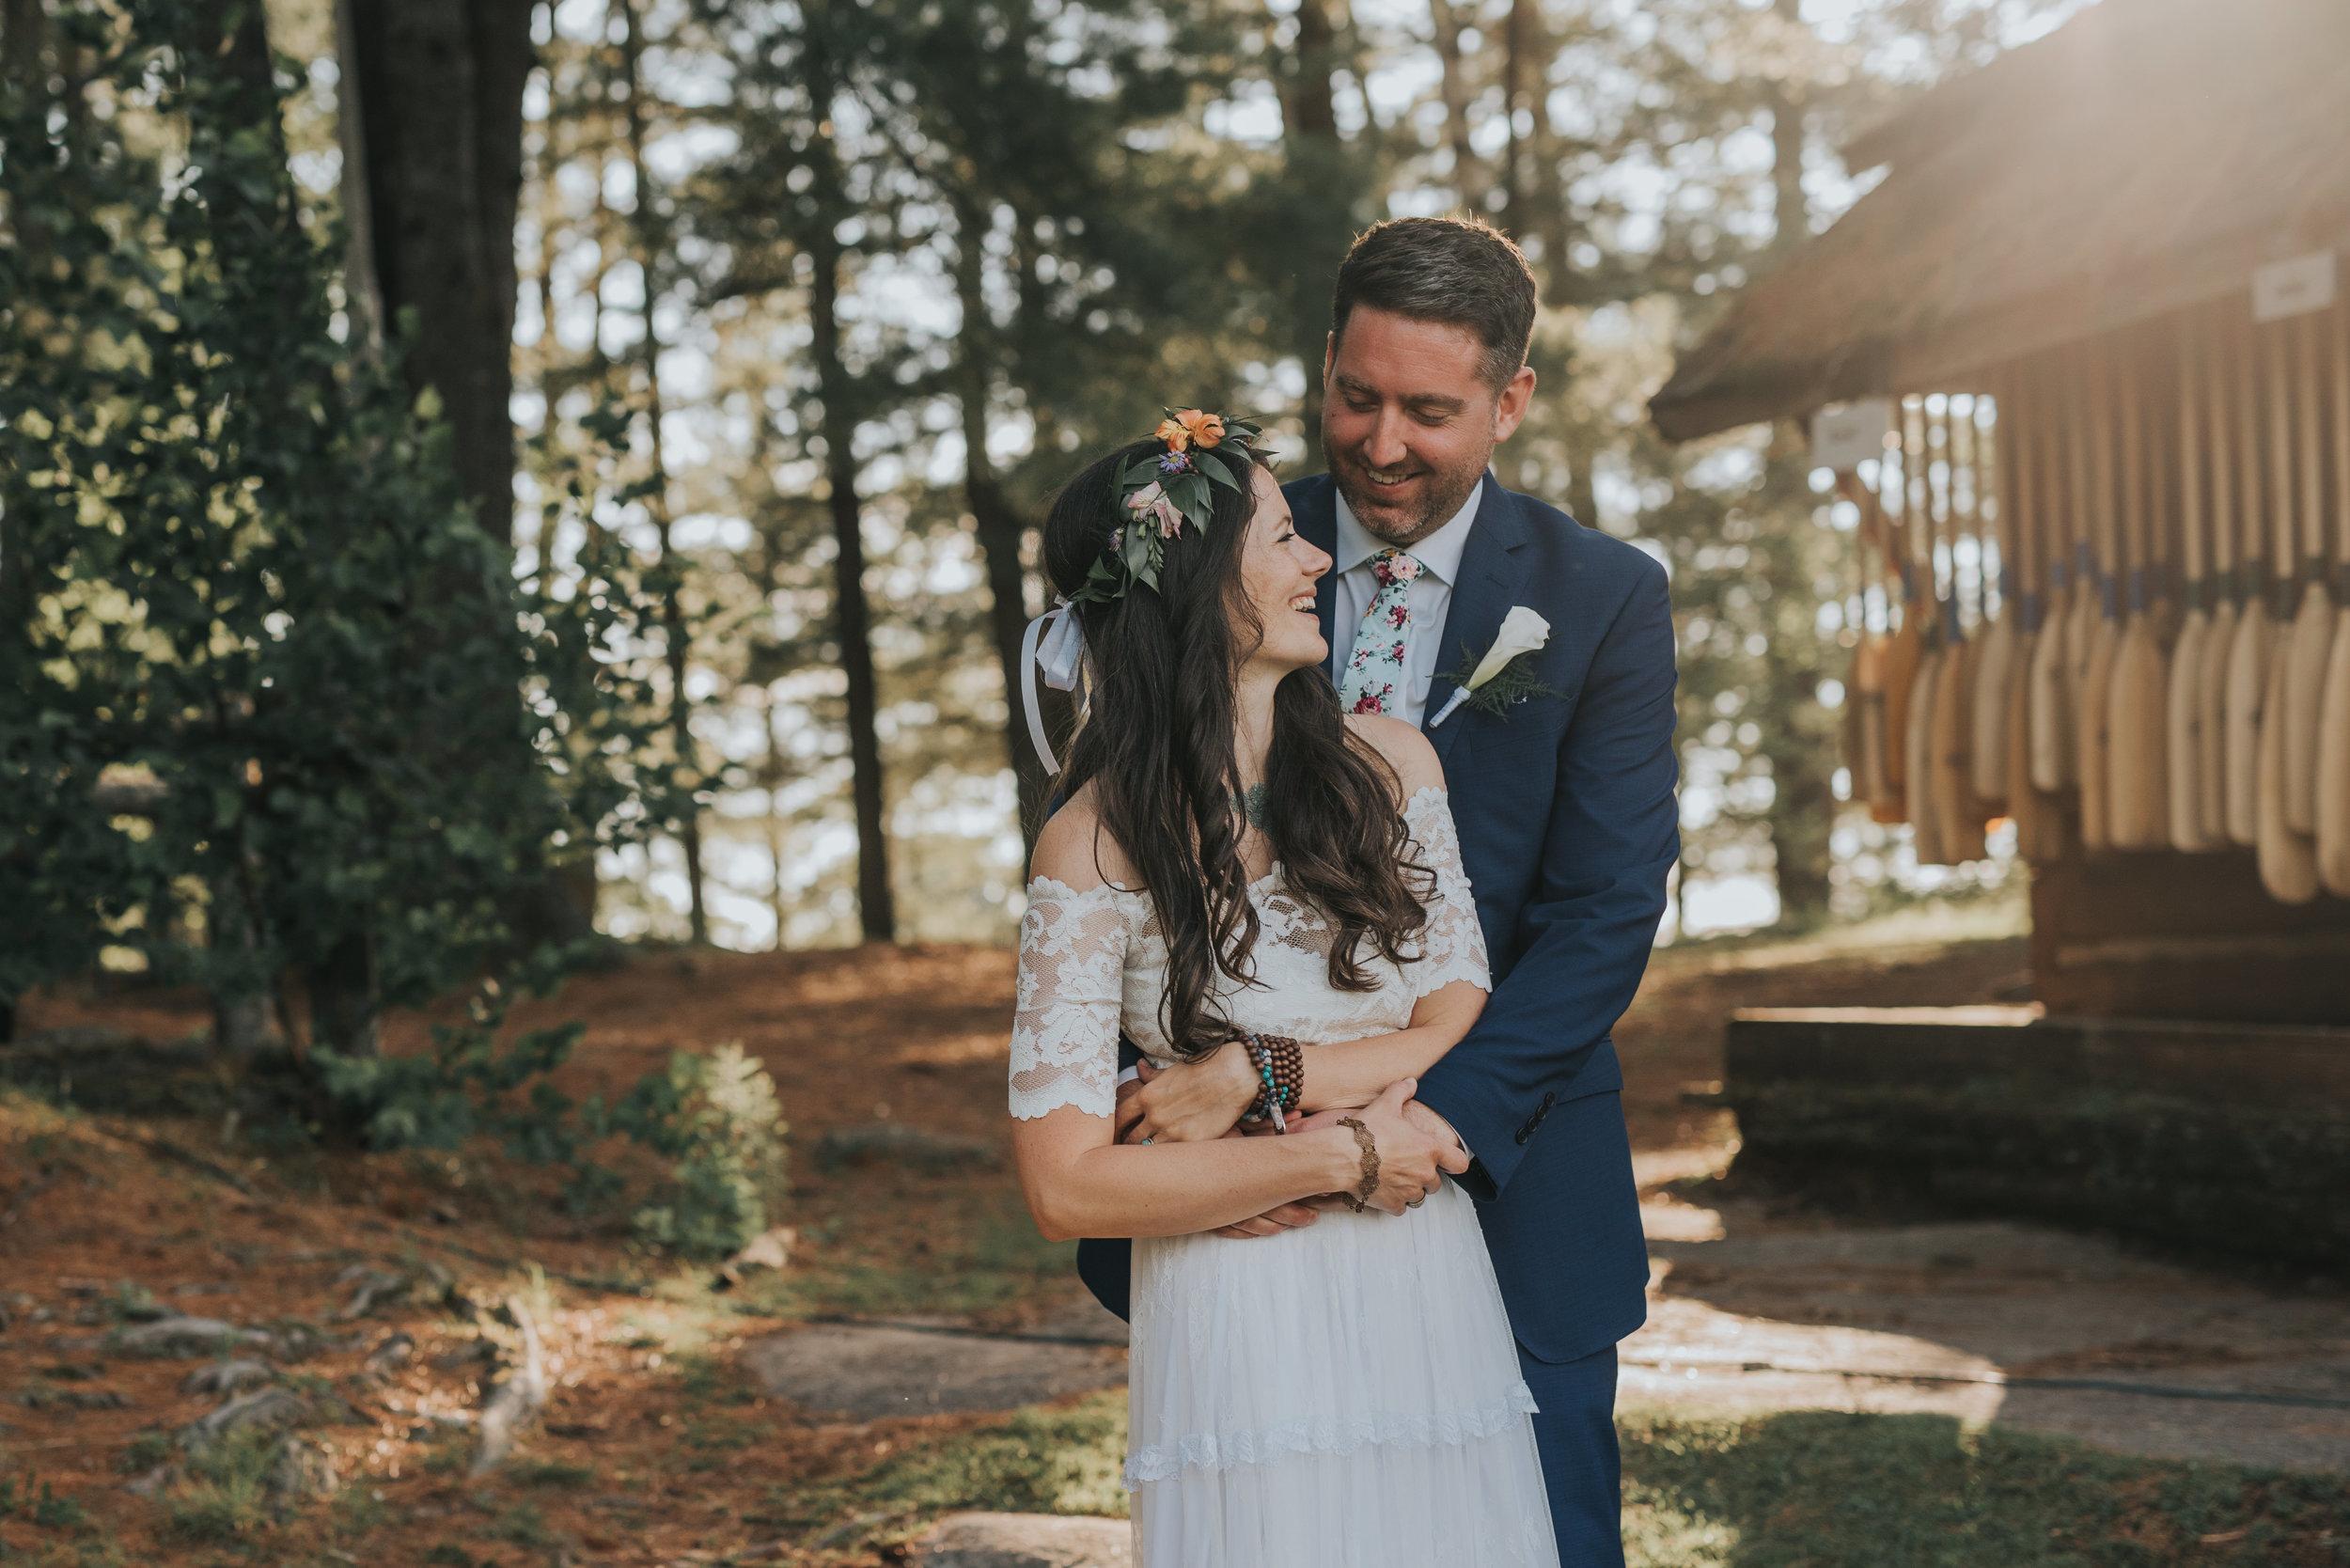 bride-groom-cuddling-rustic-cabin-toronto-bohemian-boho-outdoor-summer-wedding-documentary-wedding-photography-by-willow-birch-photo.jpg